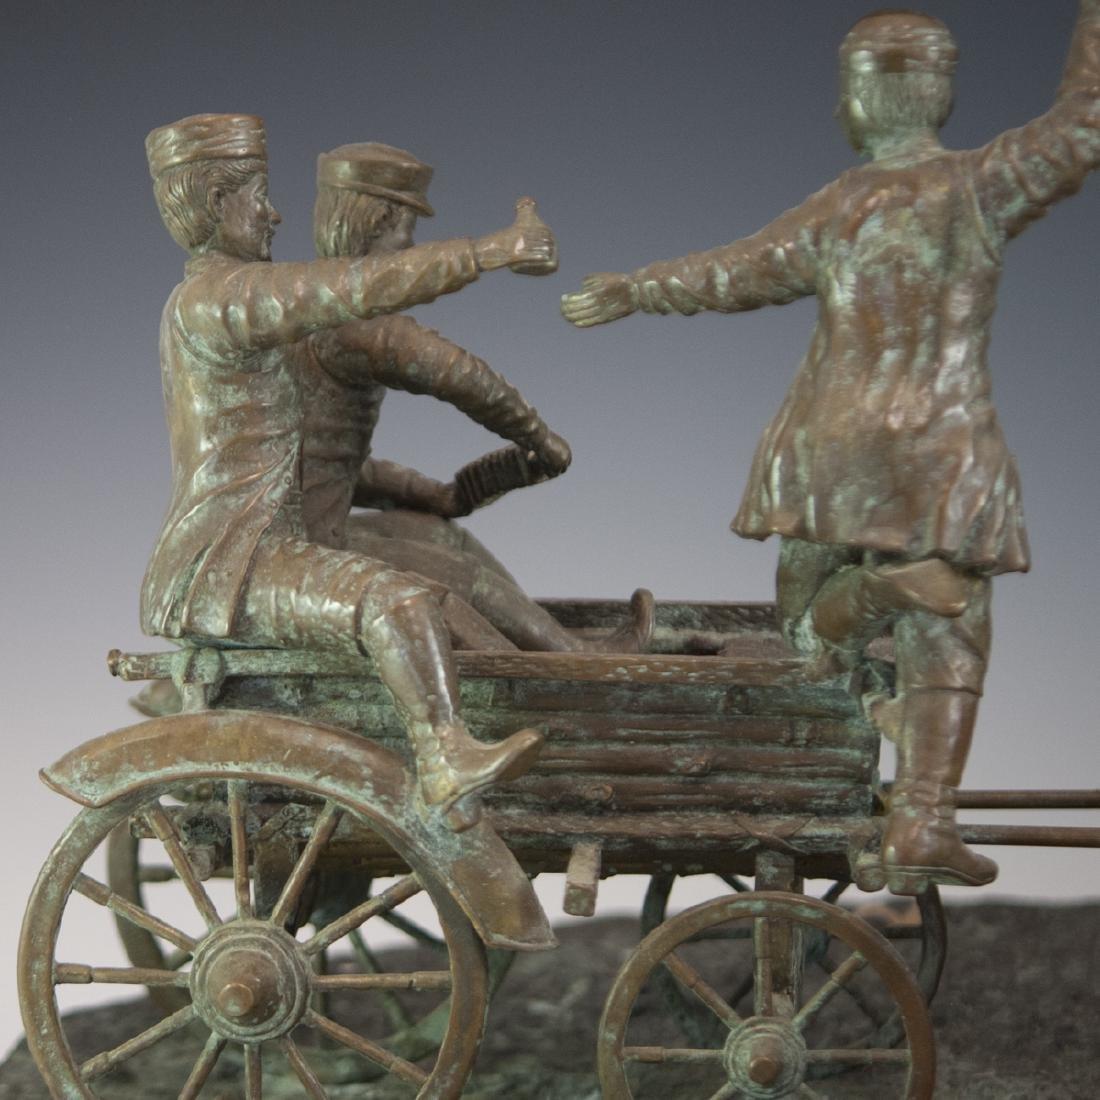 Antique Russian Figural Bronze Sculpture - 3